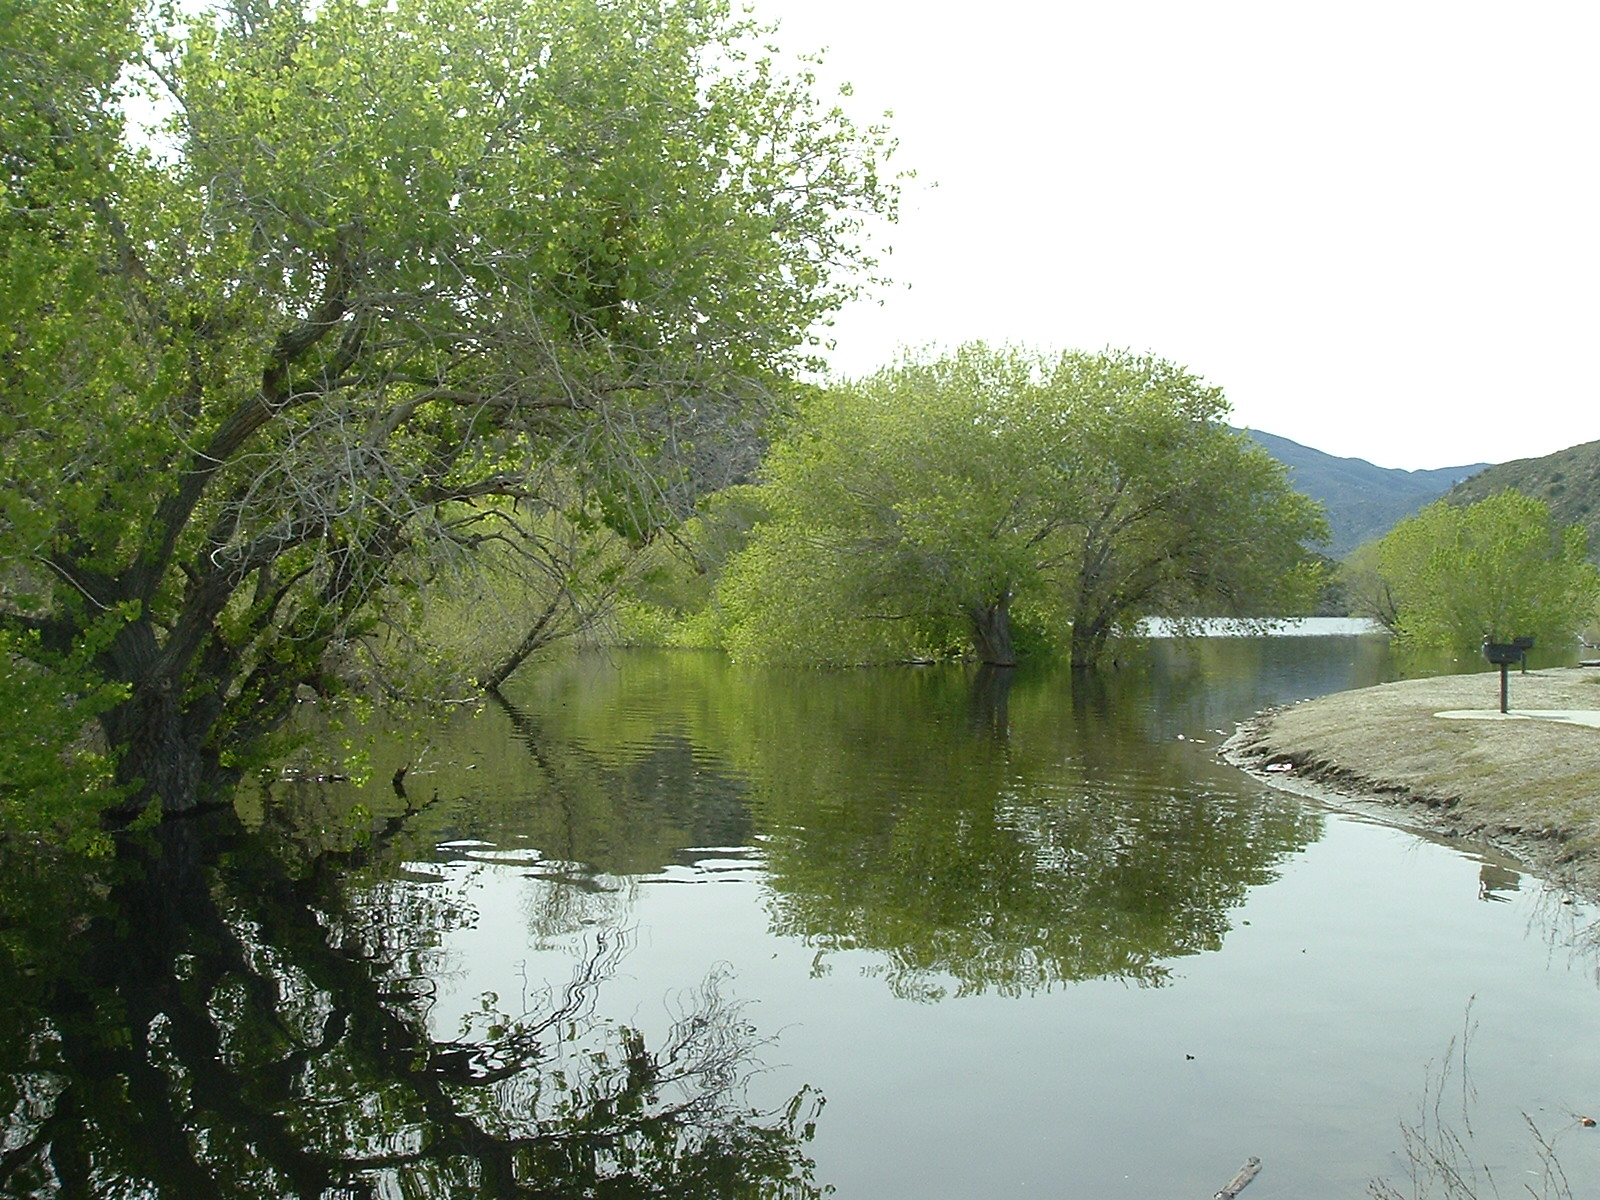 He leads me beside the still waters